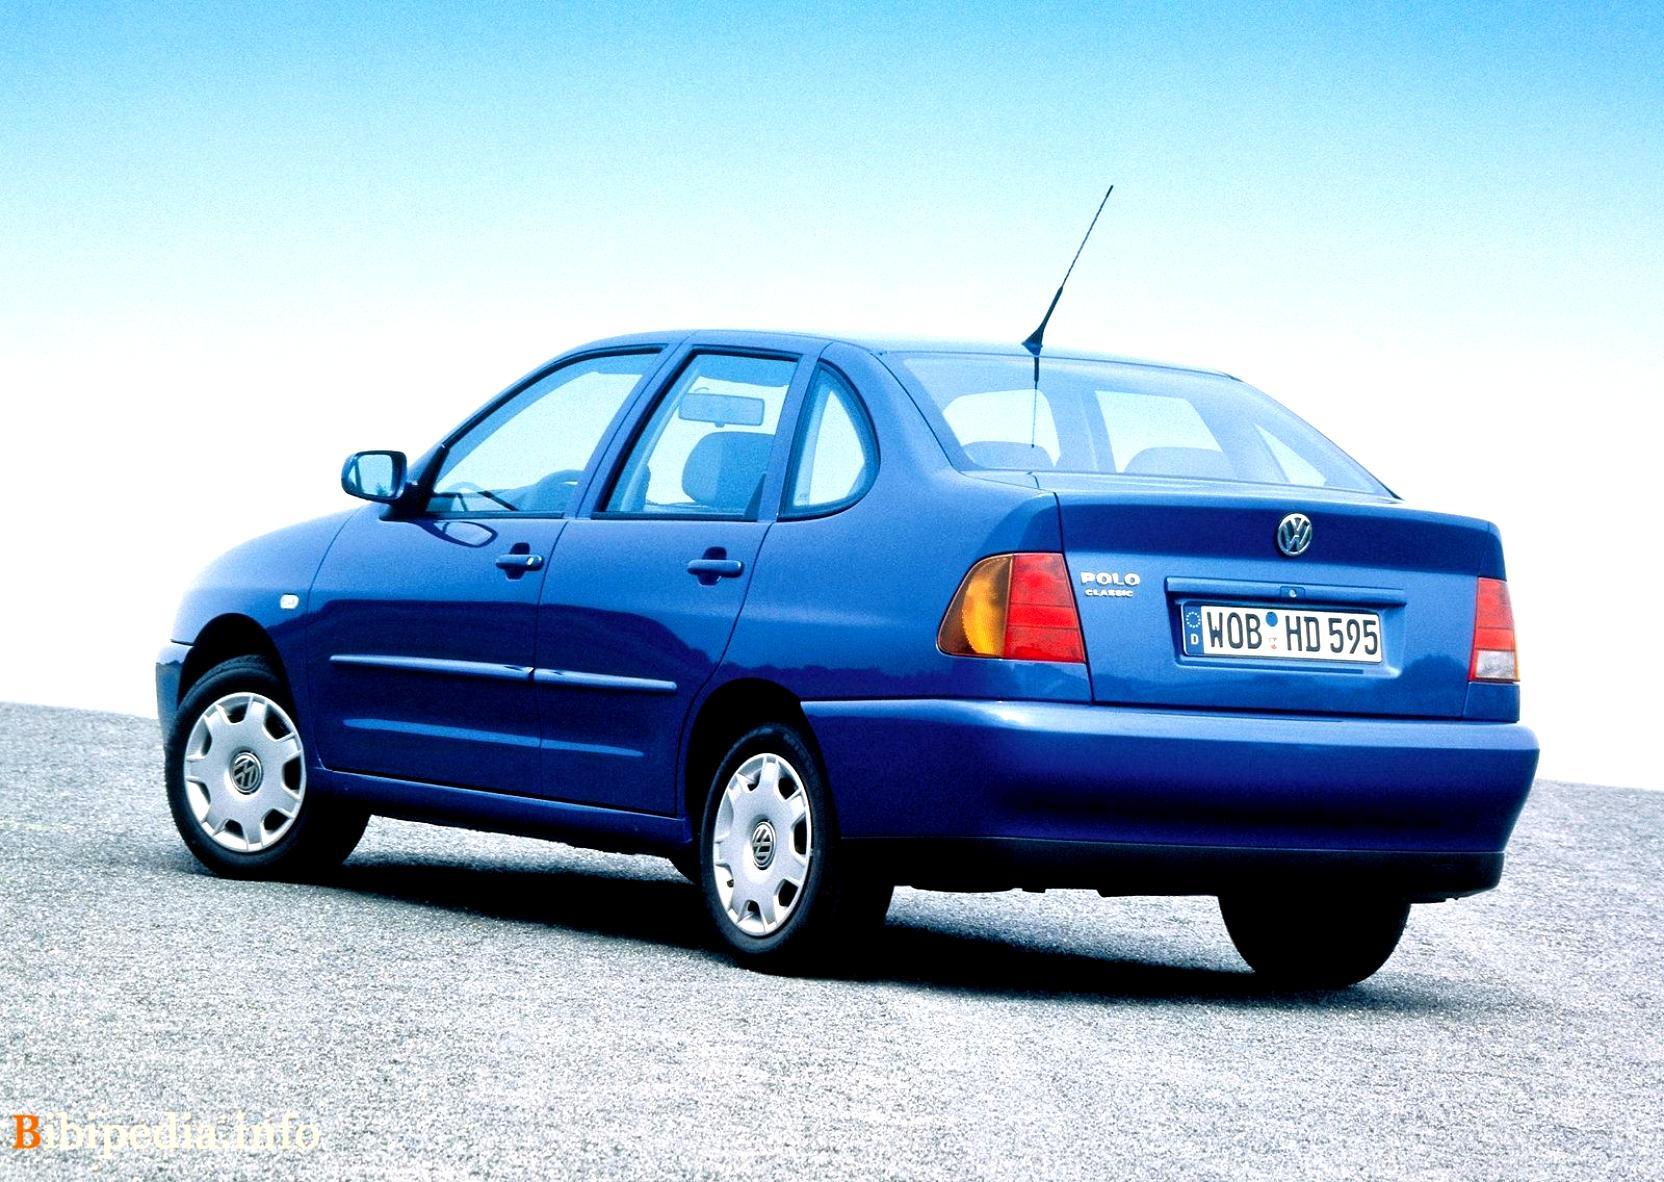 Volkswagen Polo Classic 1996 on MotoImg.com